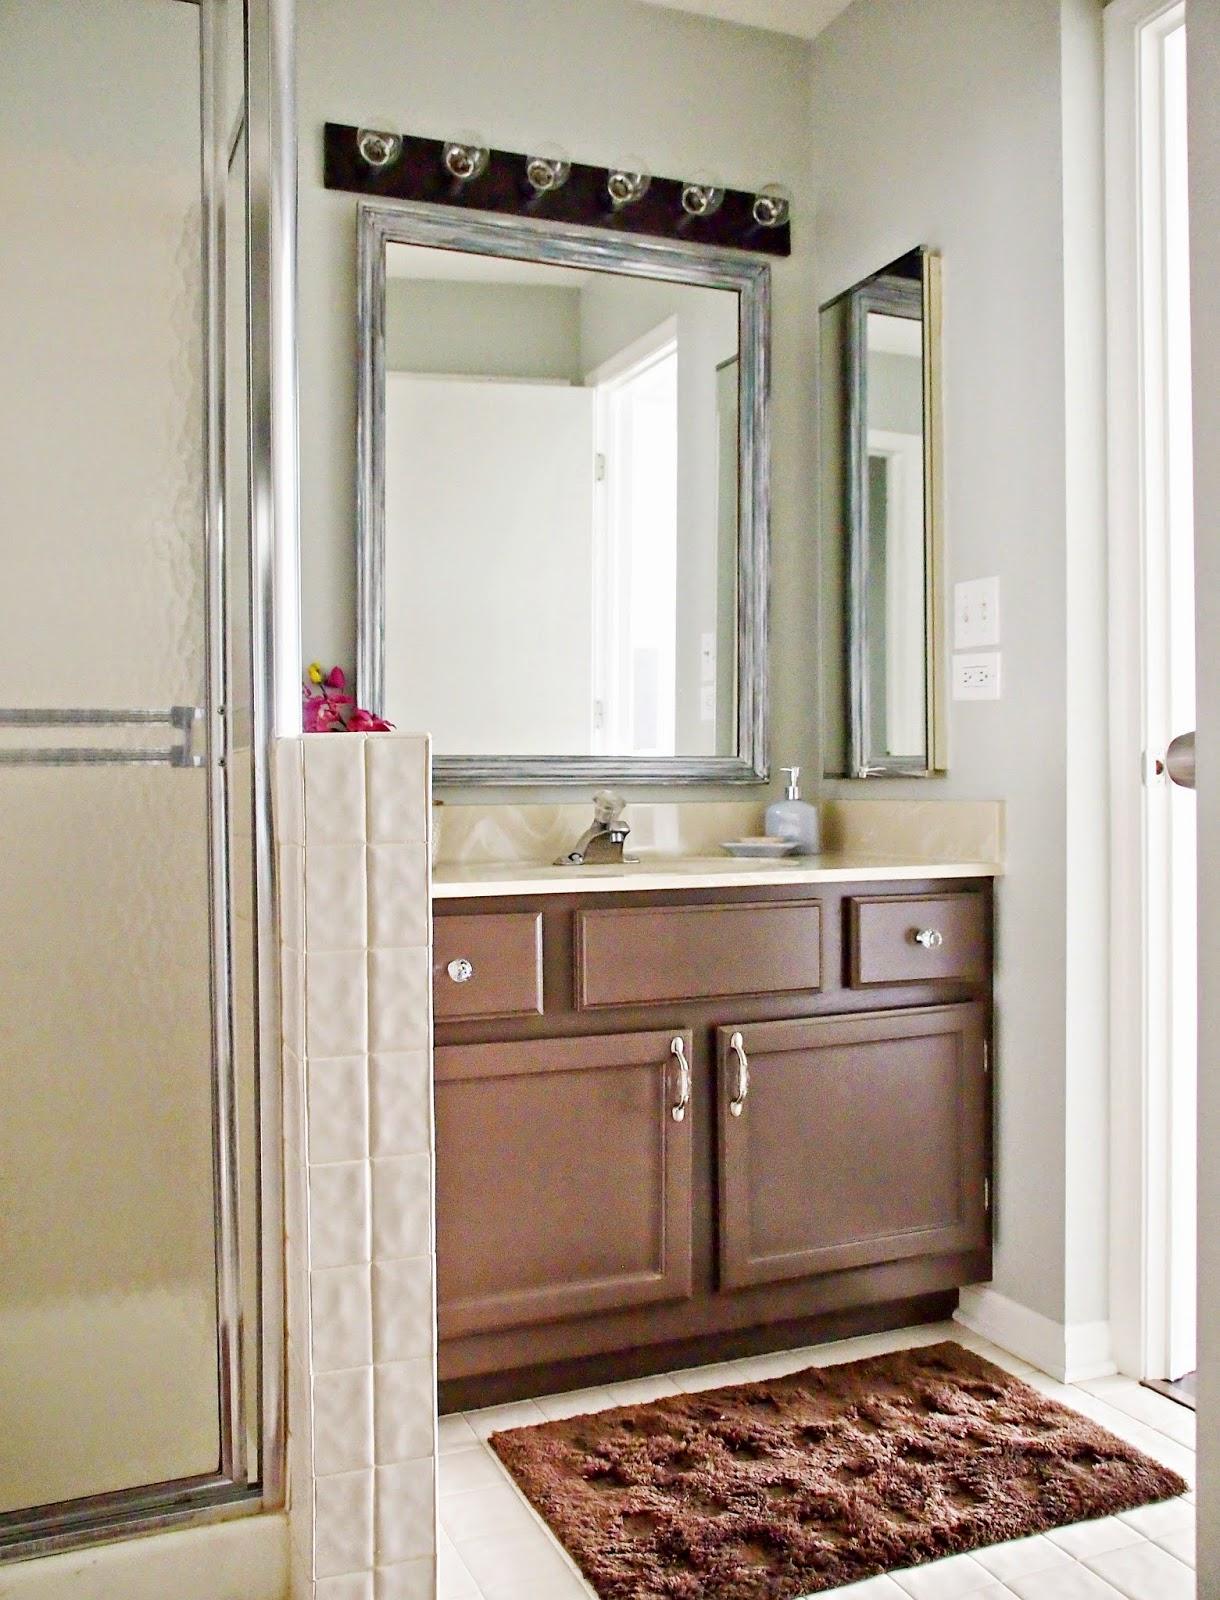 Whole Bathroom Accessories Lake Luv 2015